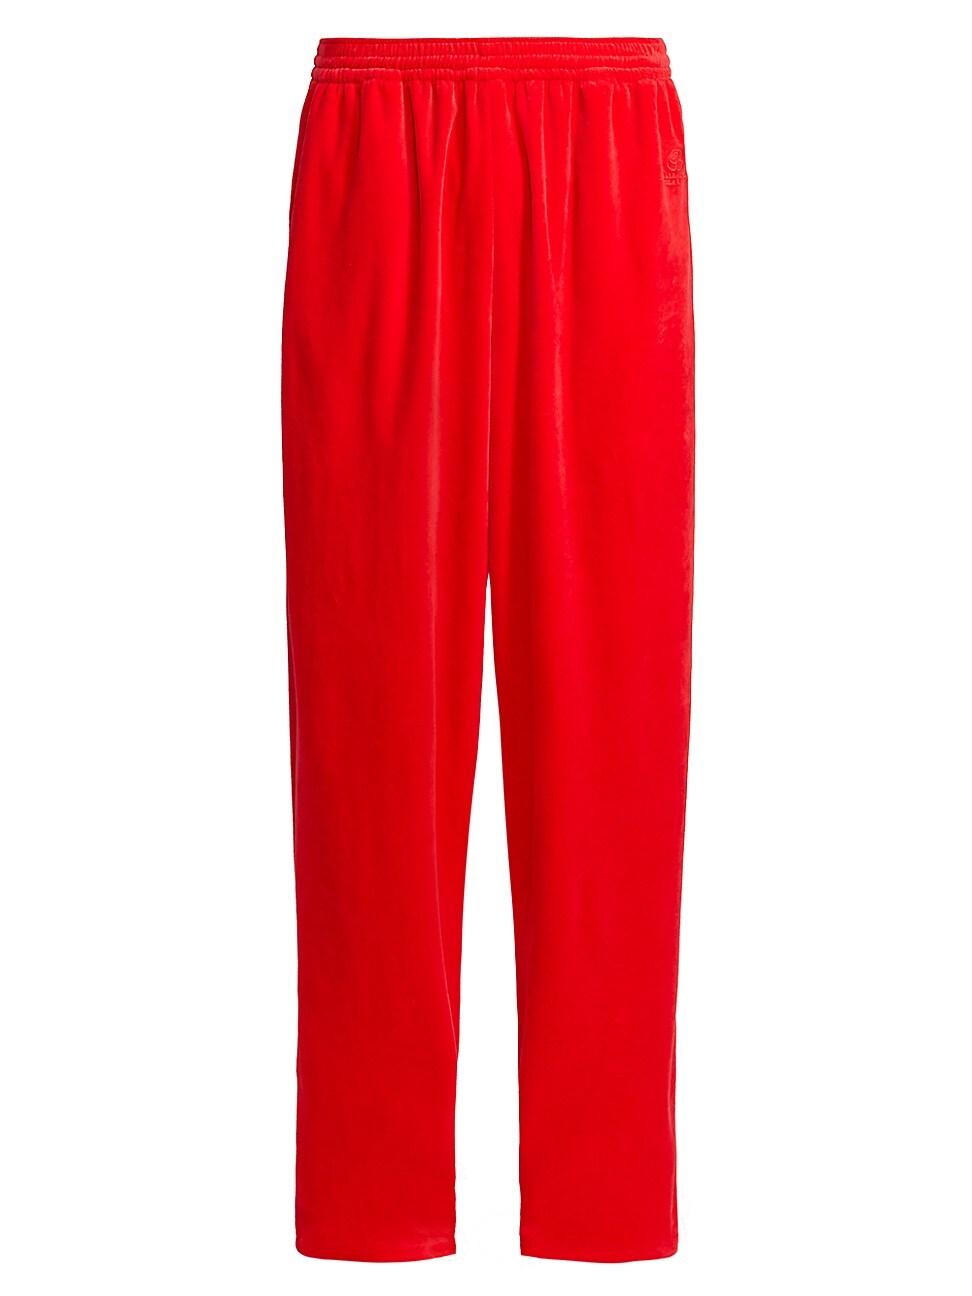 Balenciaga MEN'S VELOUR TRACKSUIT PANTS